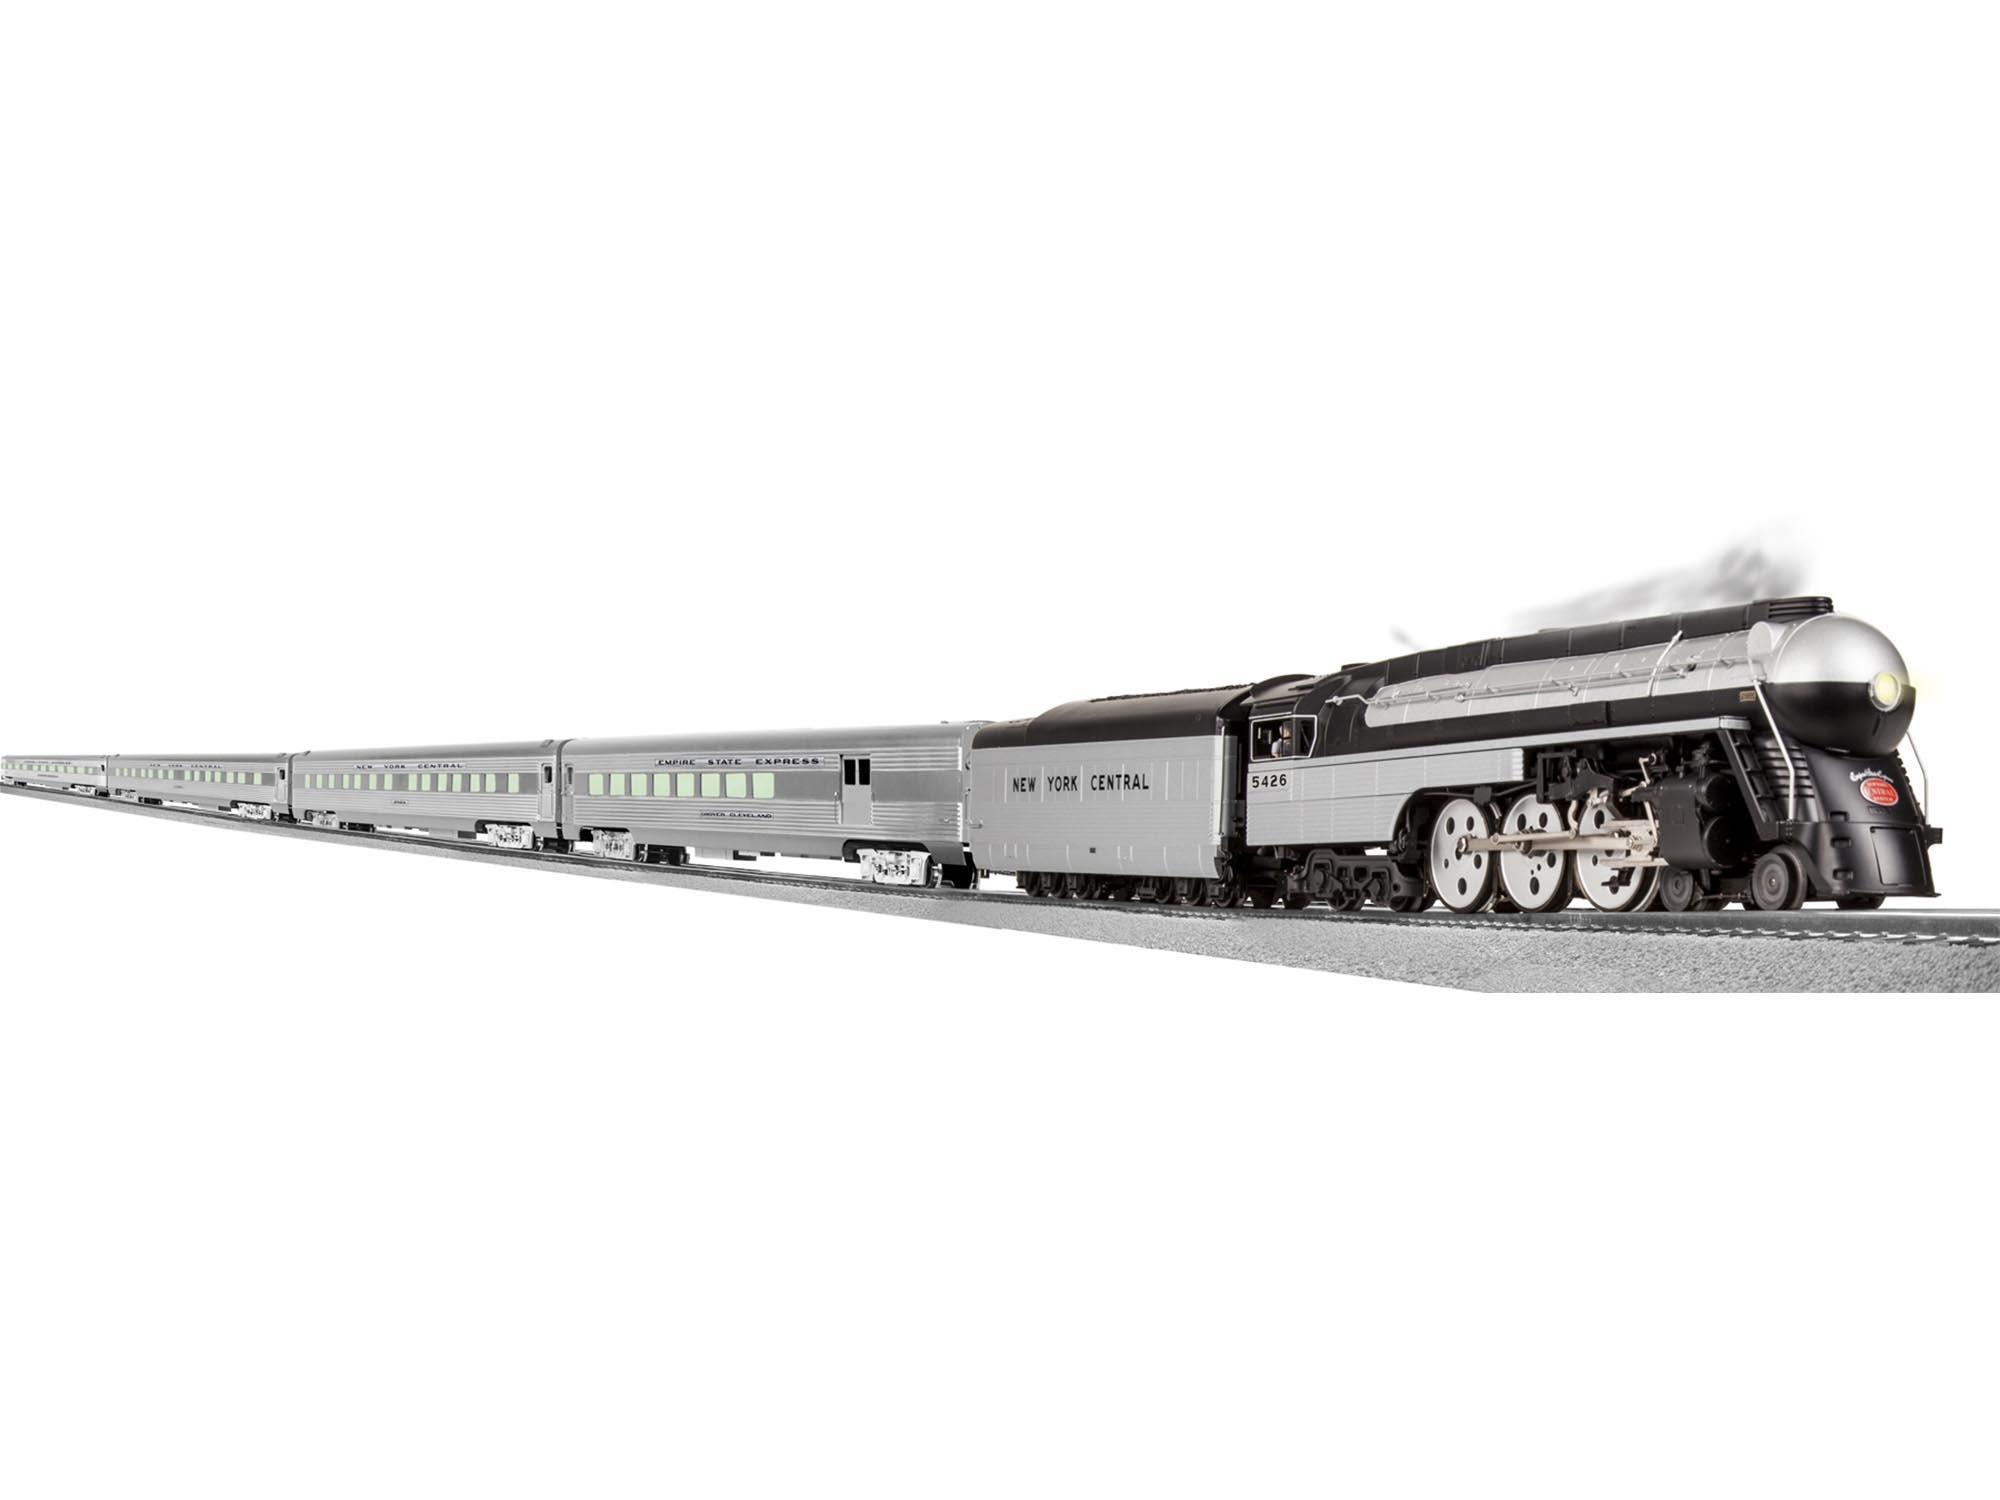 Empire State Express Set (LEGACY Scale J3a Hudson #5426)